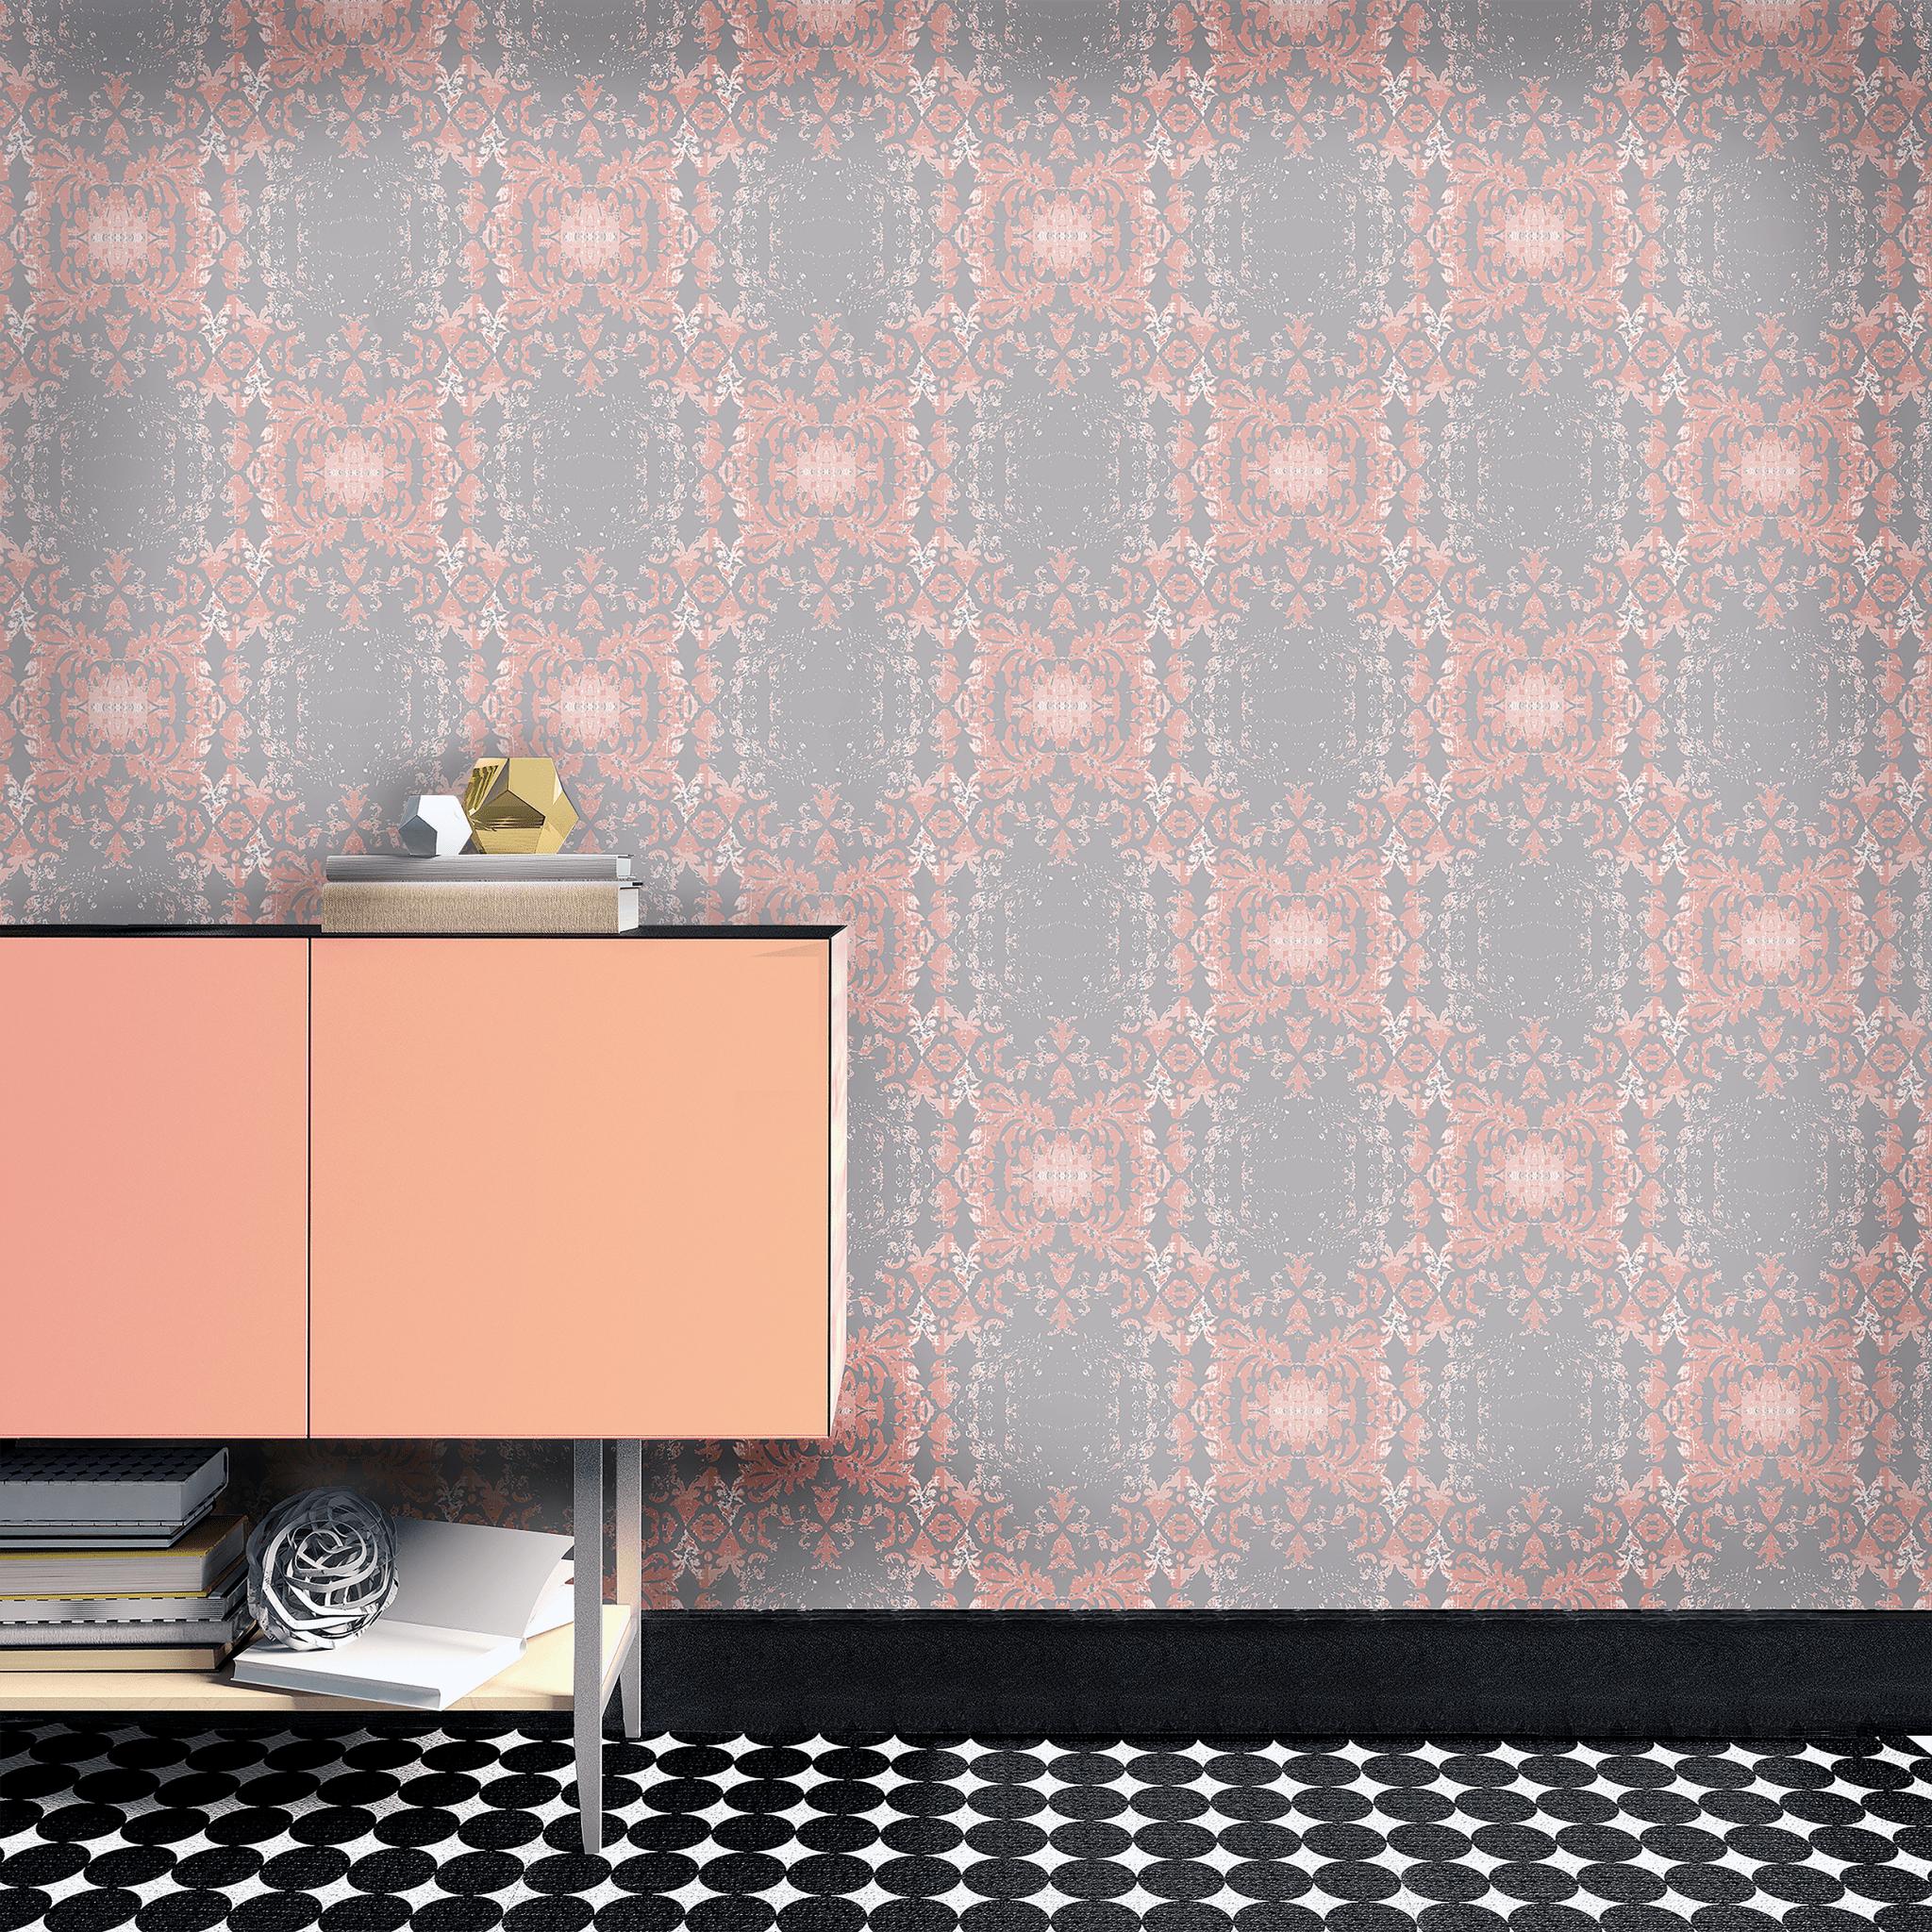 Venetian Inspired Temporary Wallpaper A Smithhonig Exclusive Removable Wallpaper Diy Wallpaper Removal Solution Diy Wallpaper